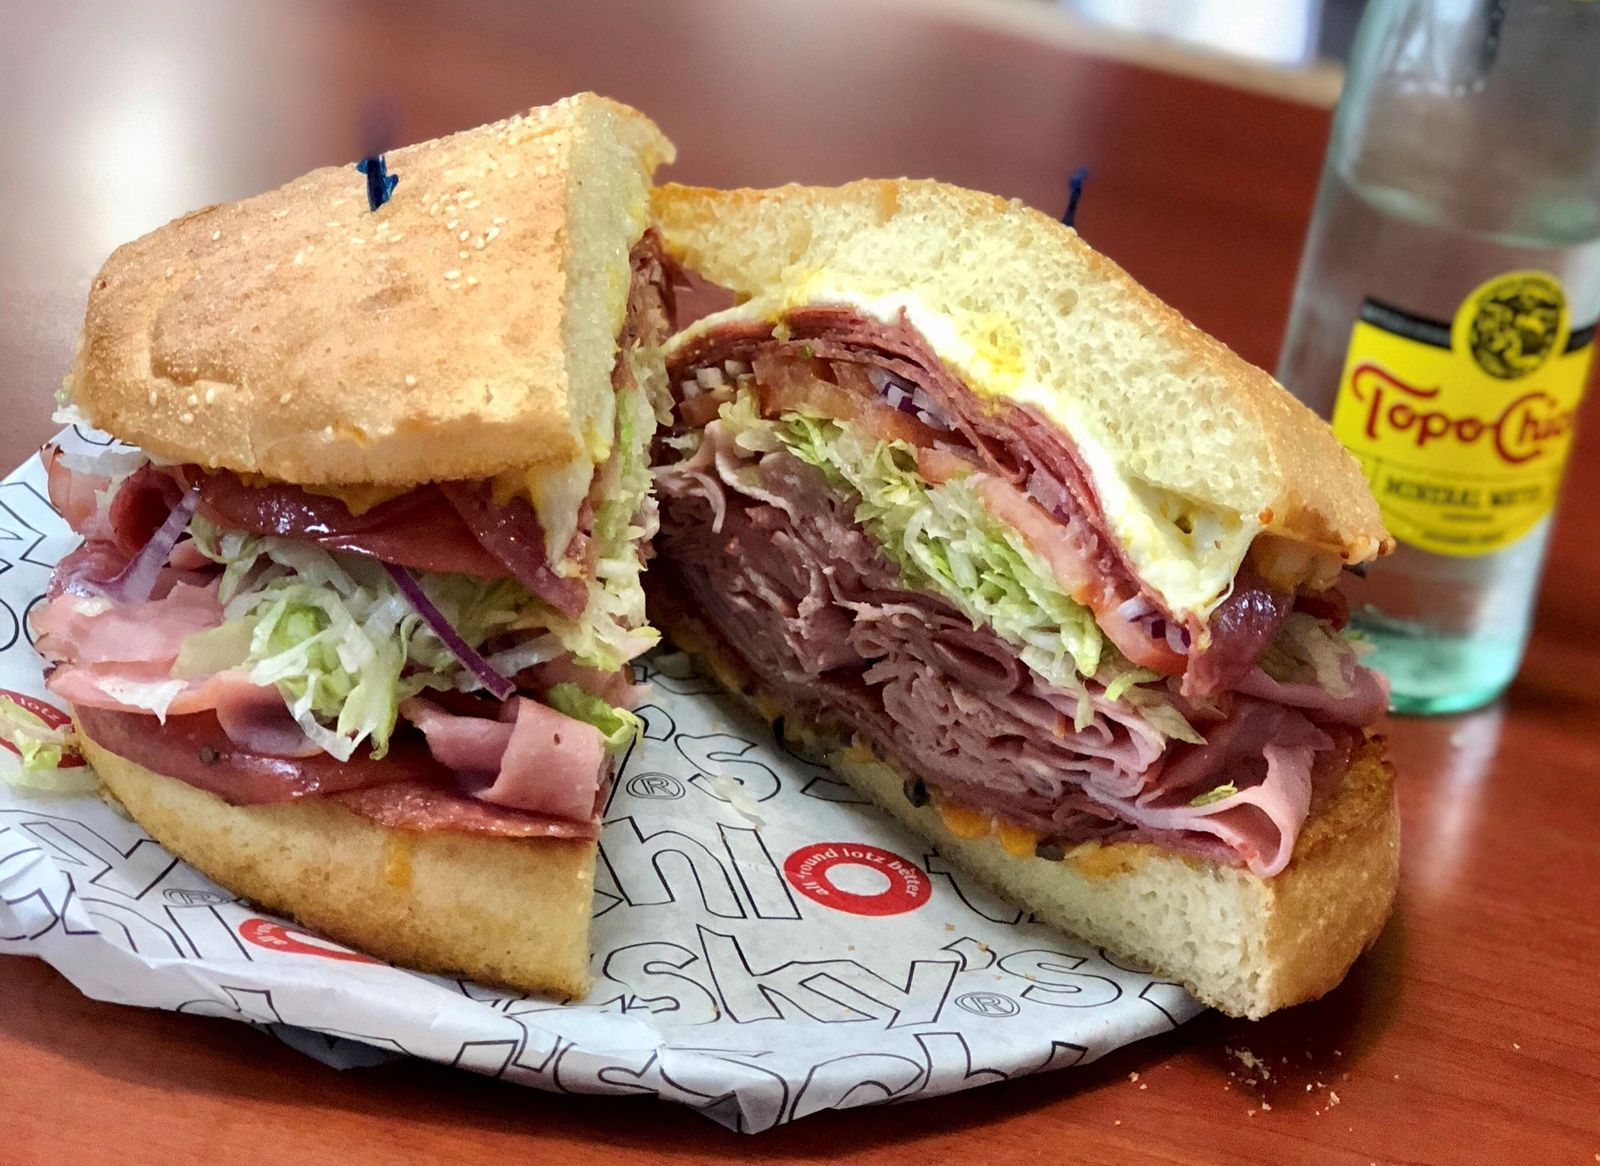 Schlotzsky's Celebrates National Sandwich Day with Free Sandwiches